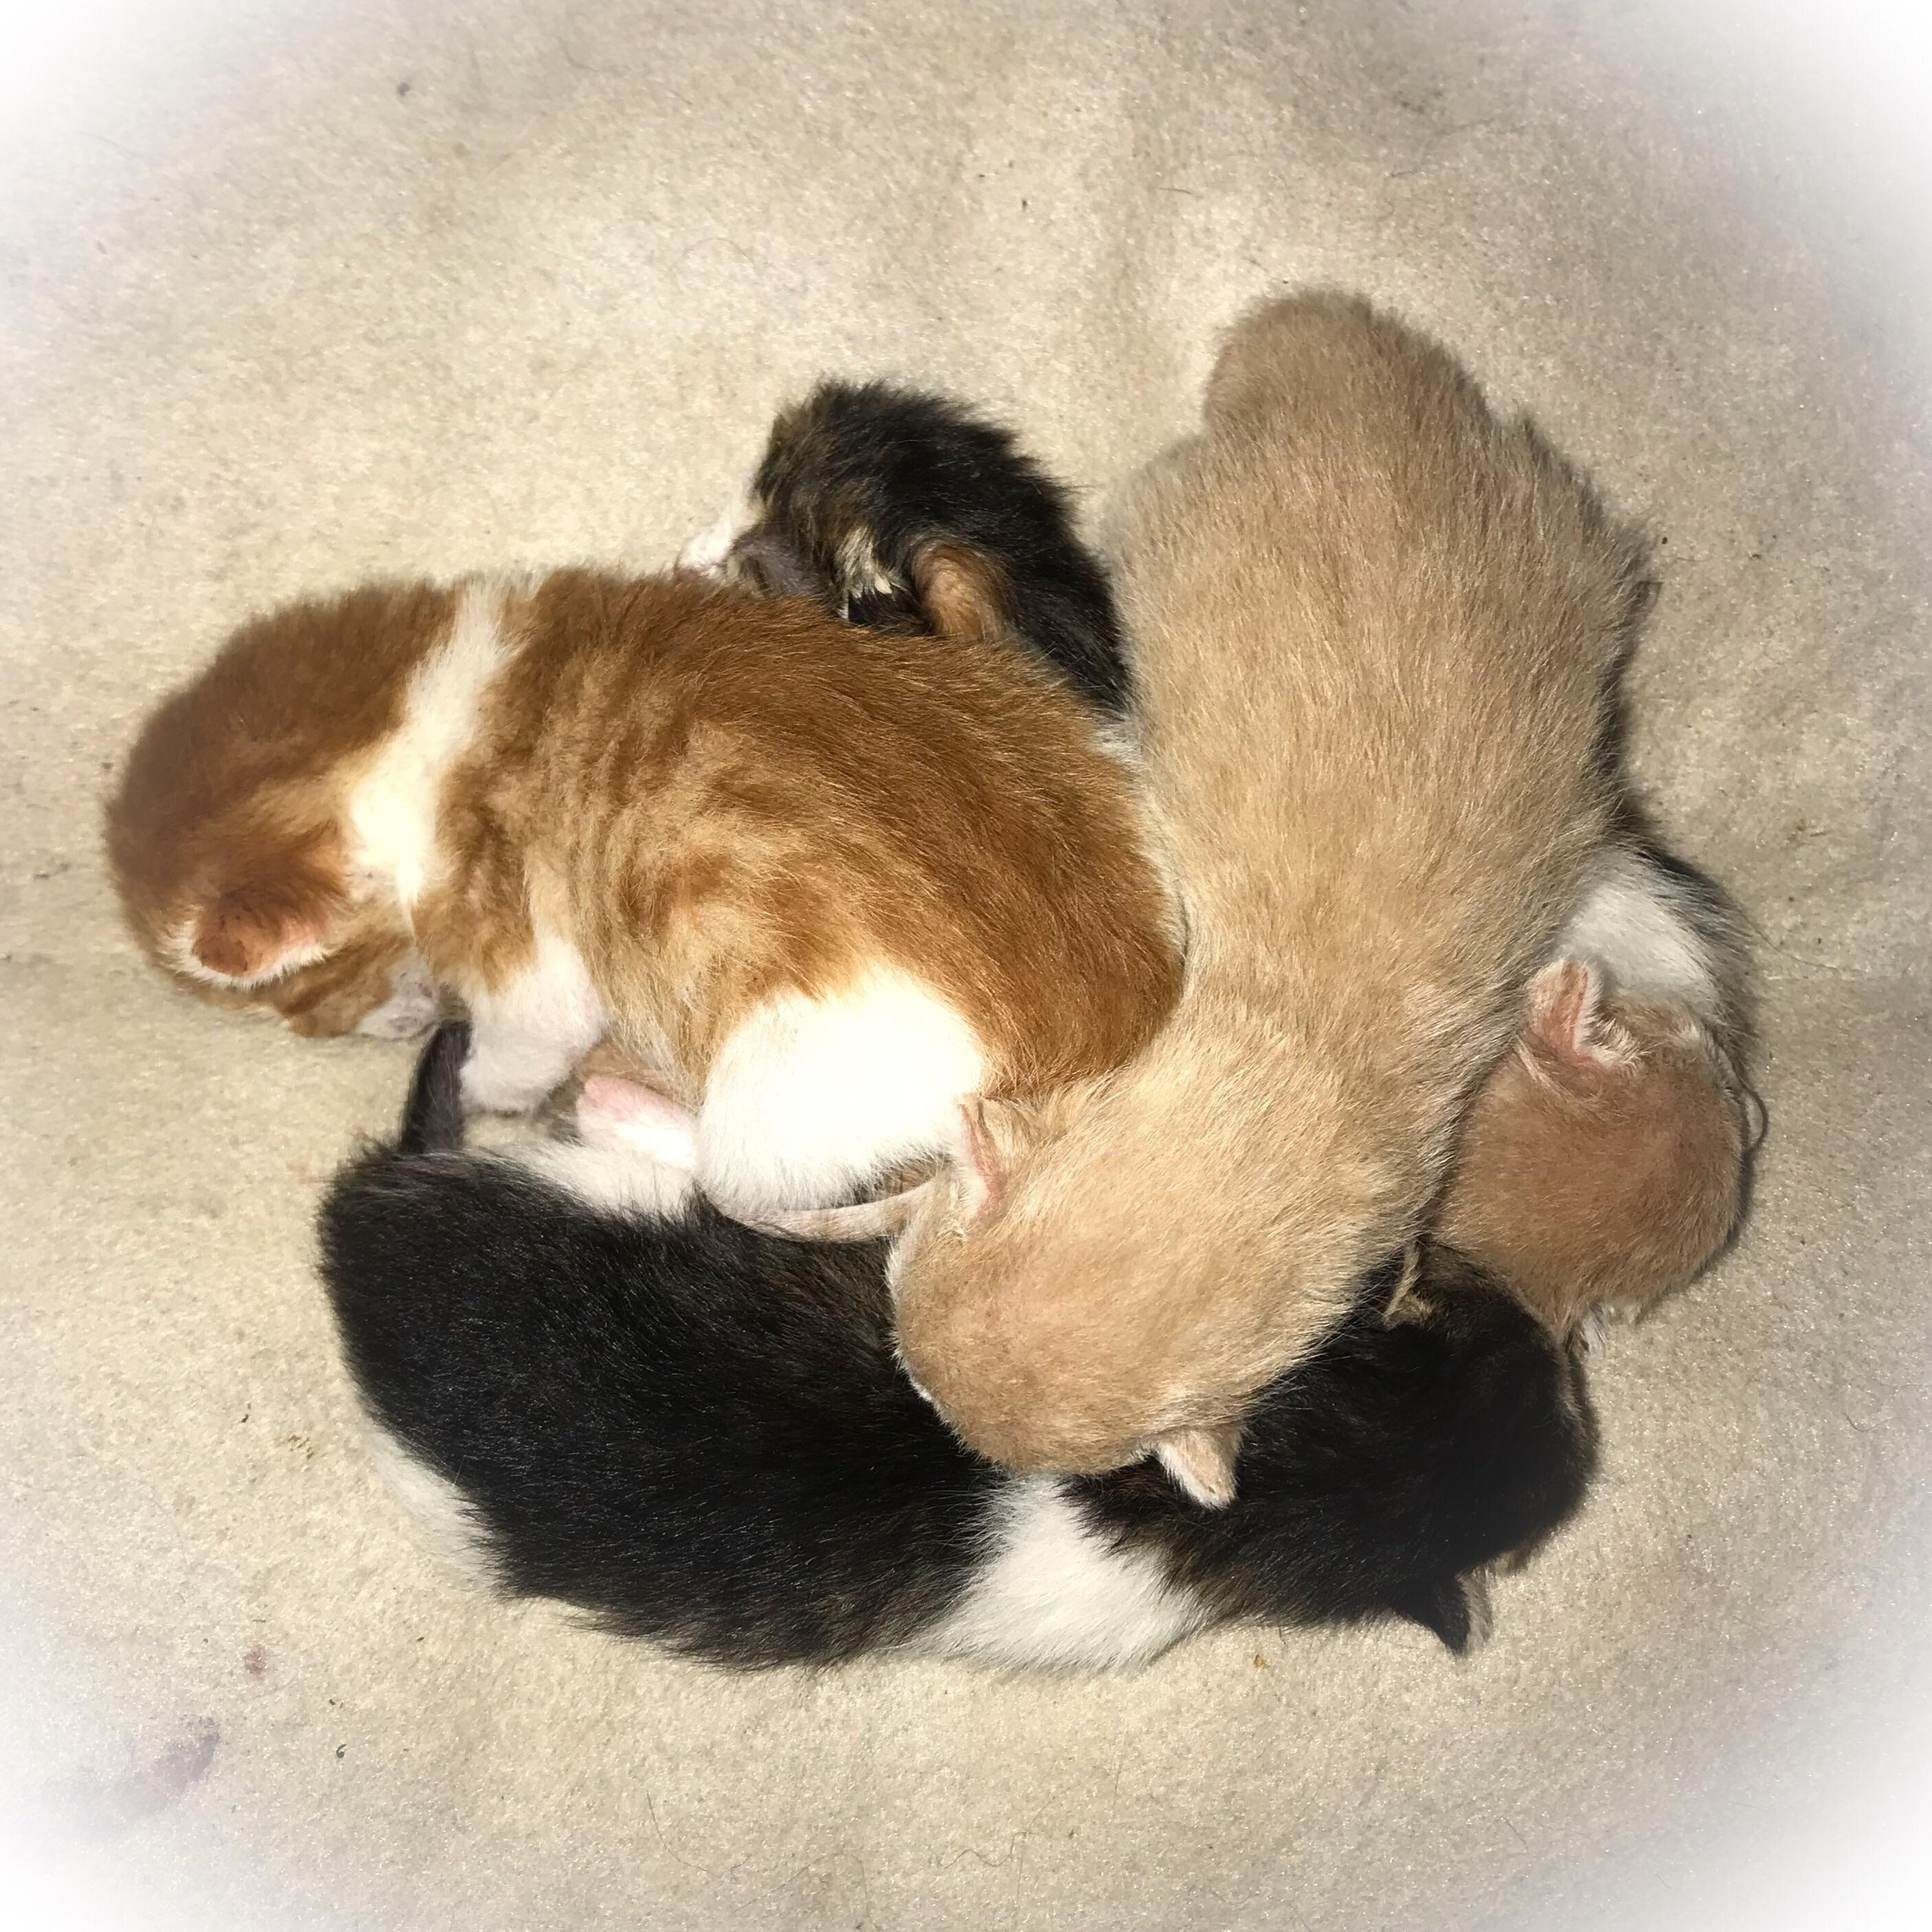 My Sweet Destiny Had Her Babies Last Night 5 Kittens In Her First Last Litter Kittens Kittens Cutest Cute Cats